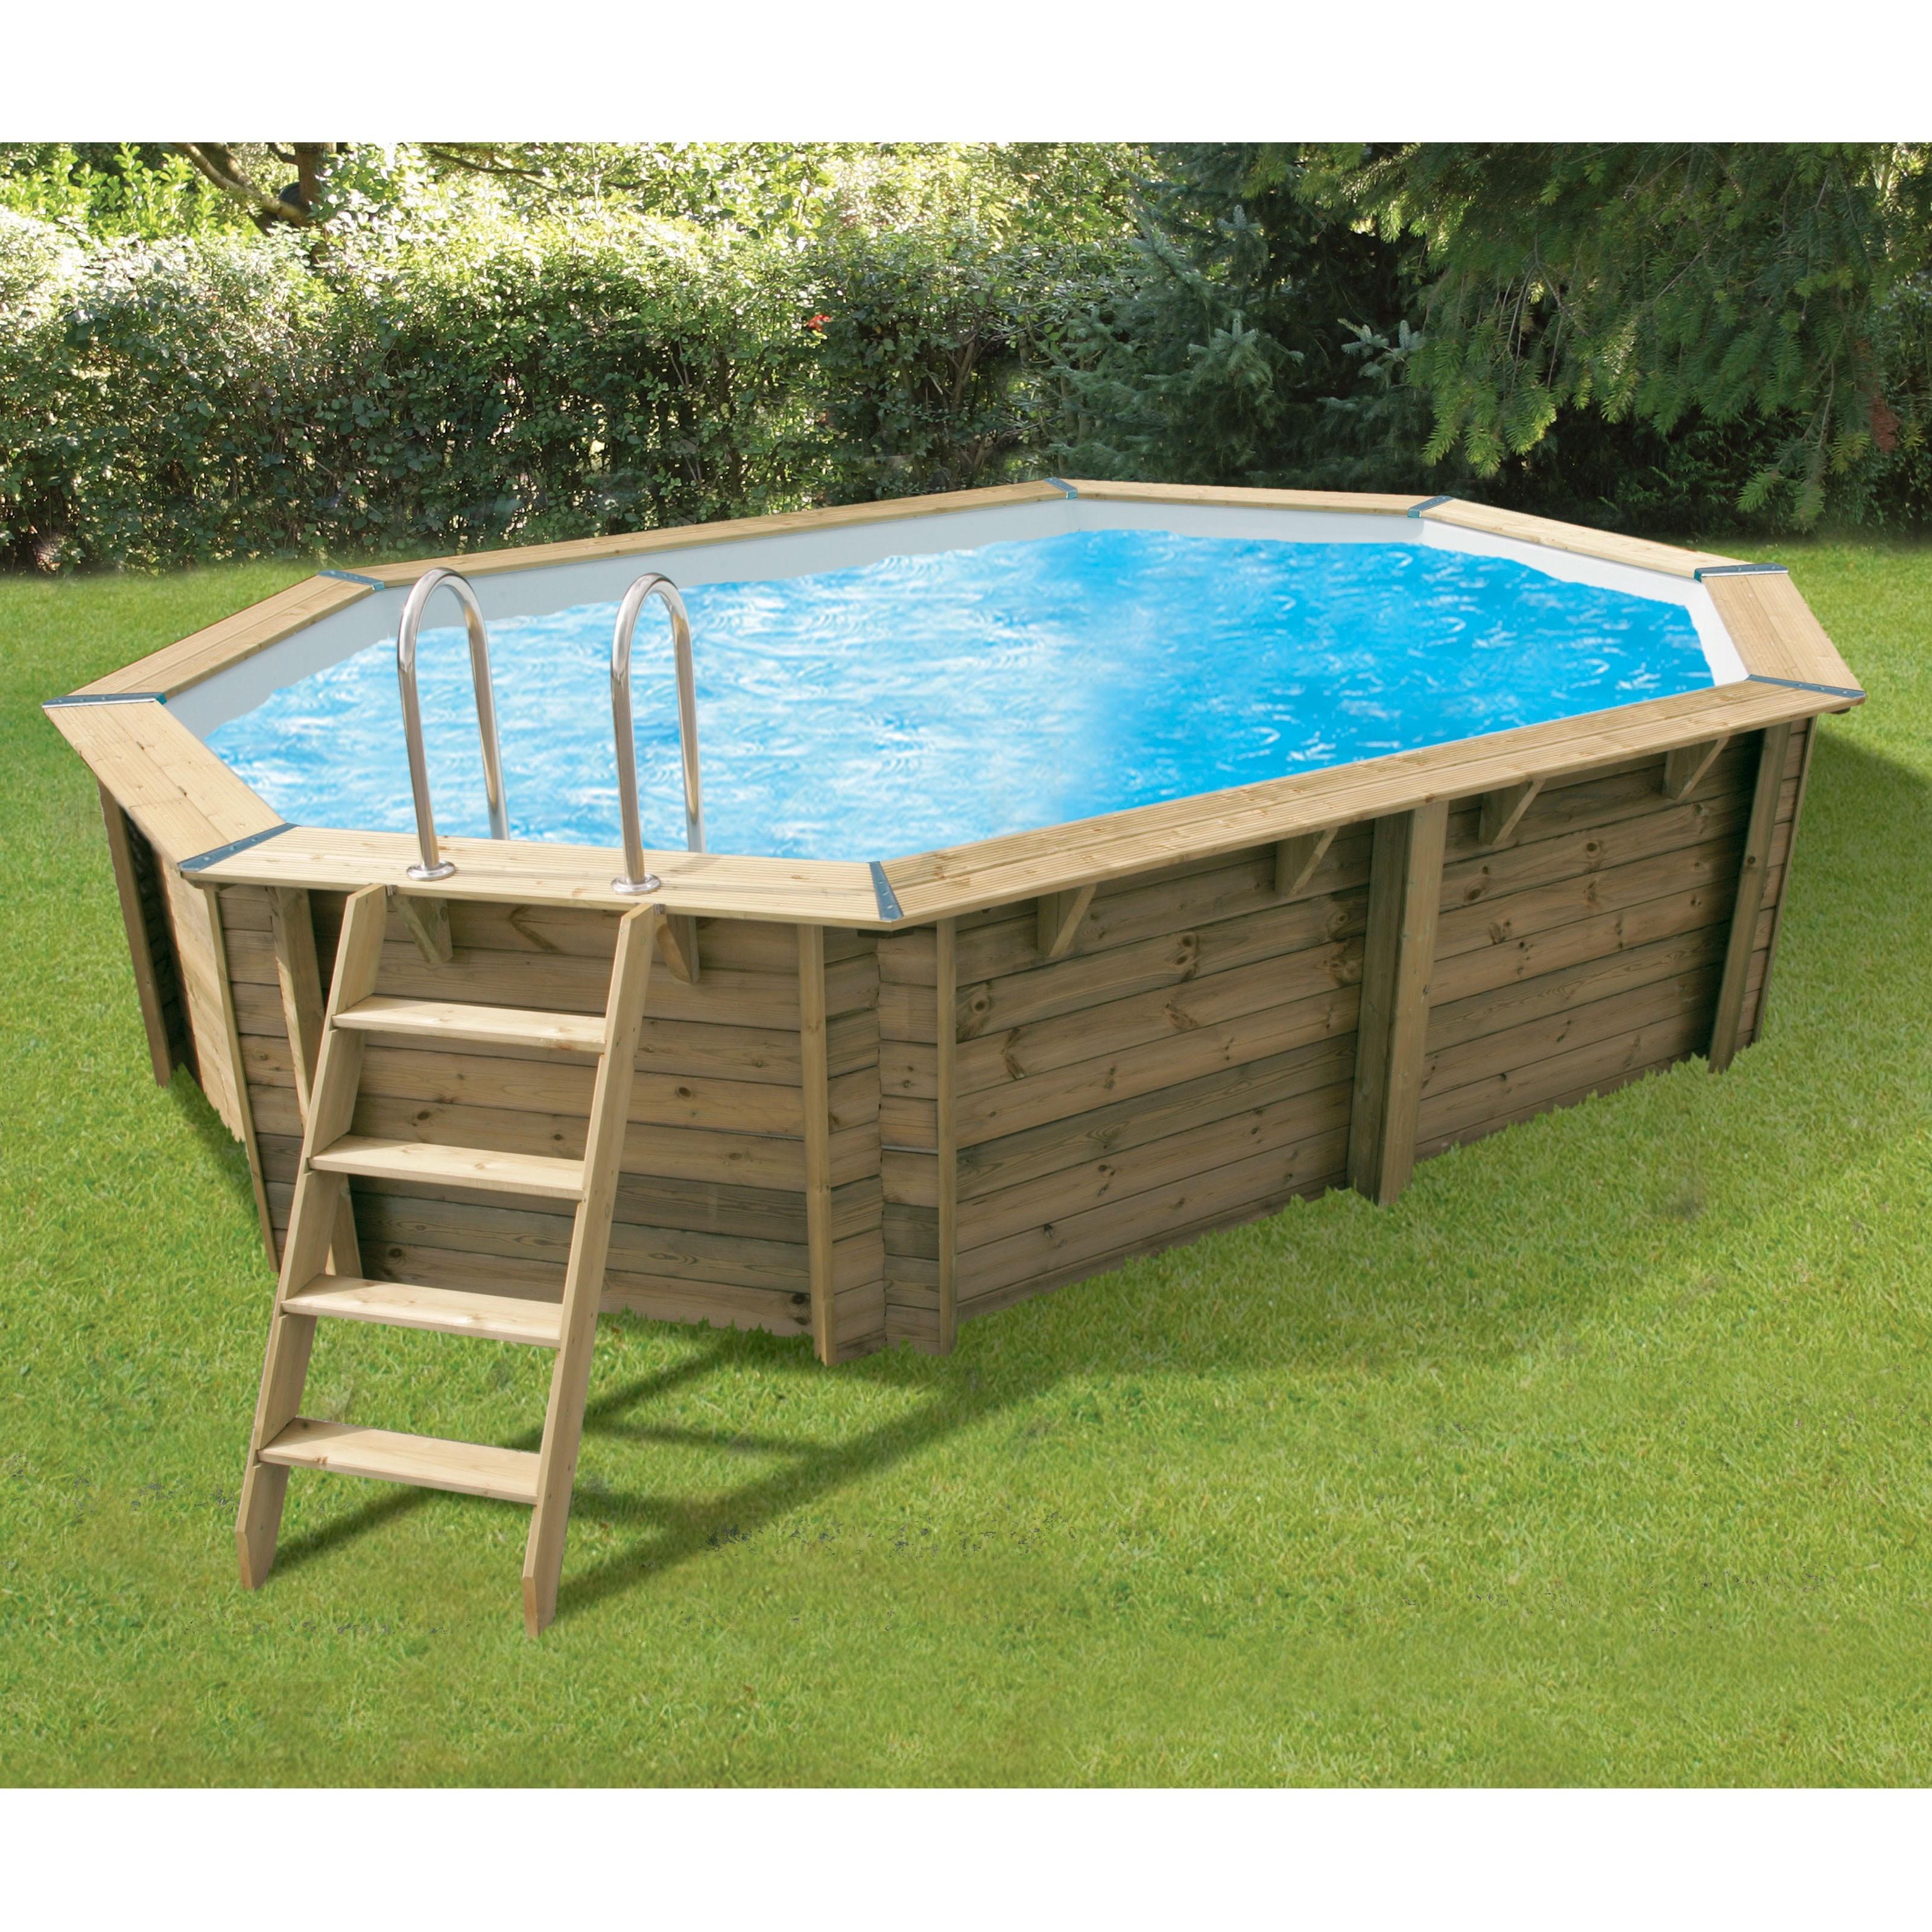 Swimming pool Océa 355x550x120cm - beige liner - Ubbink (delivery: 15 days)